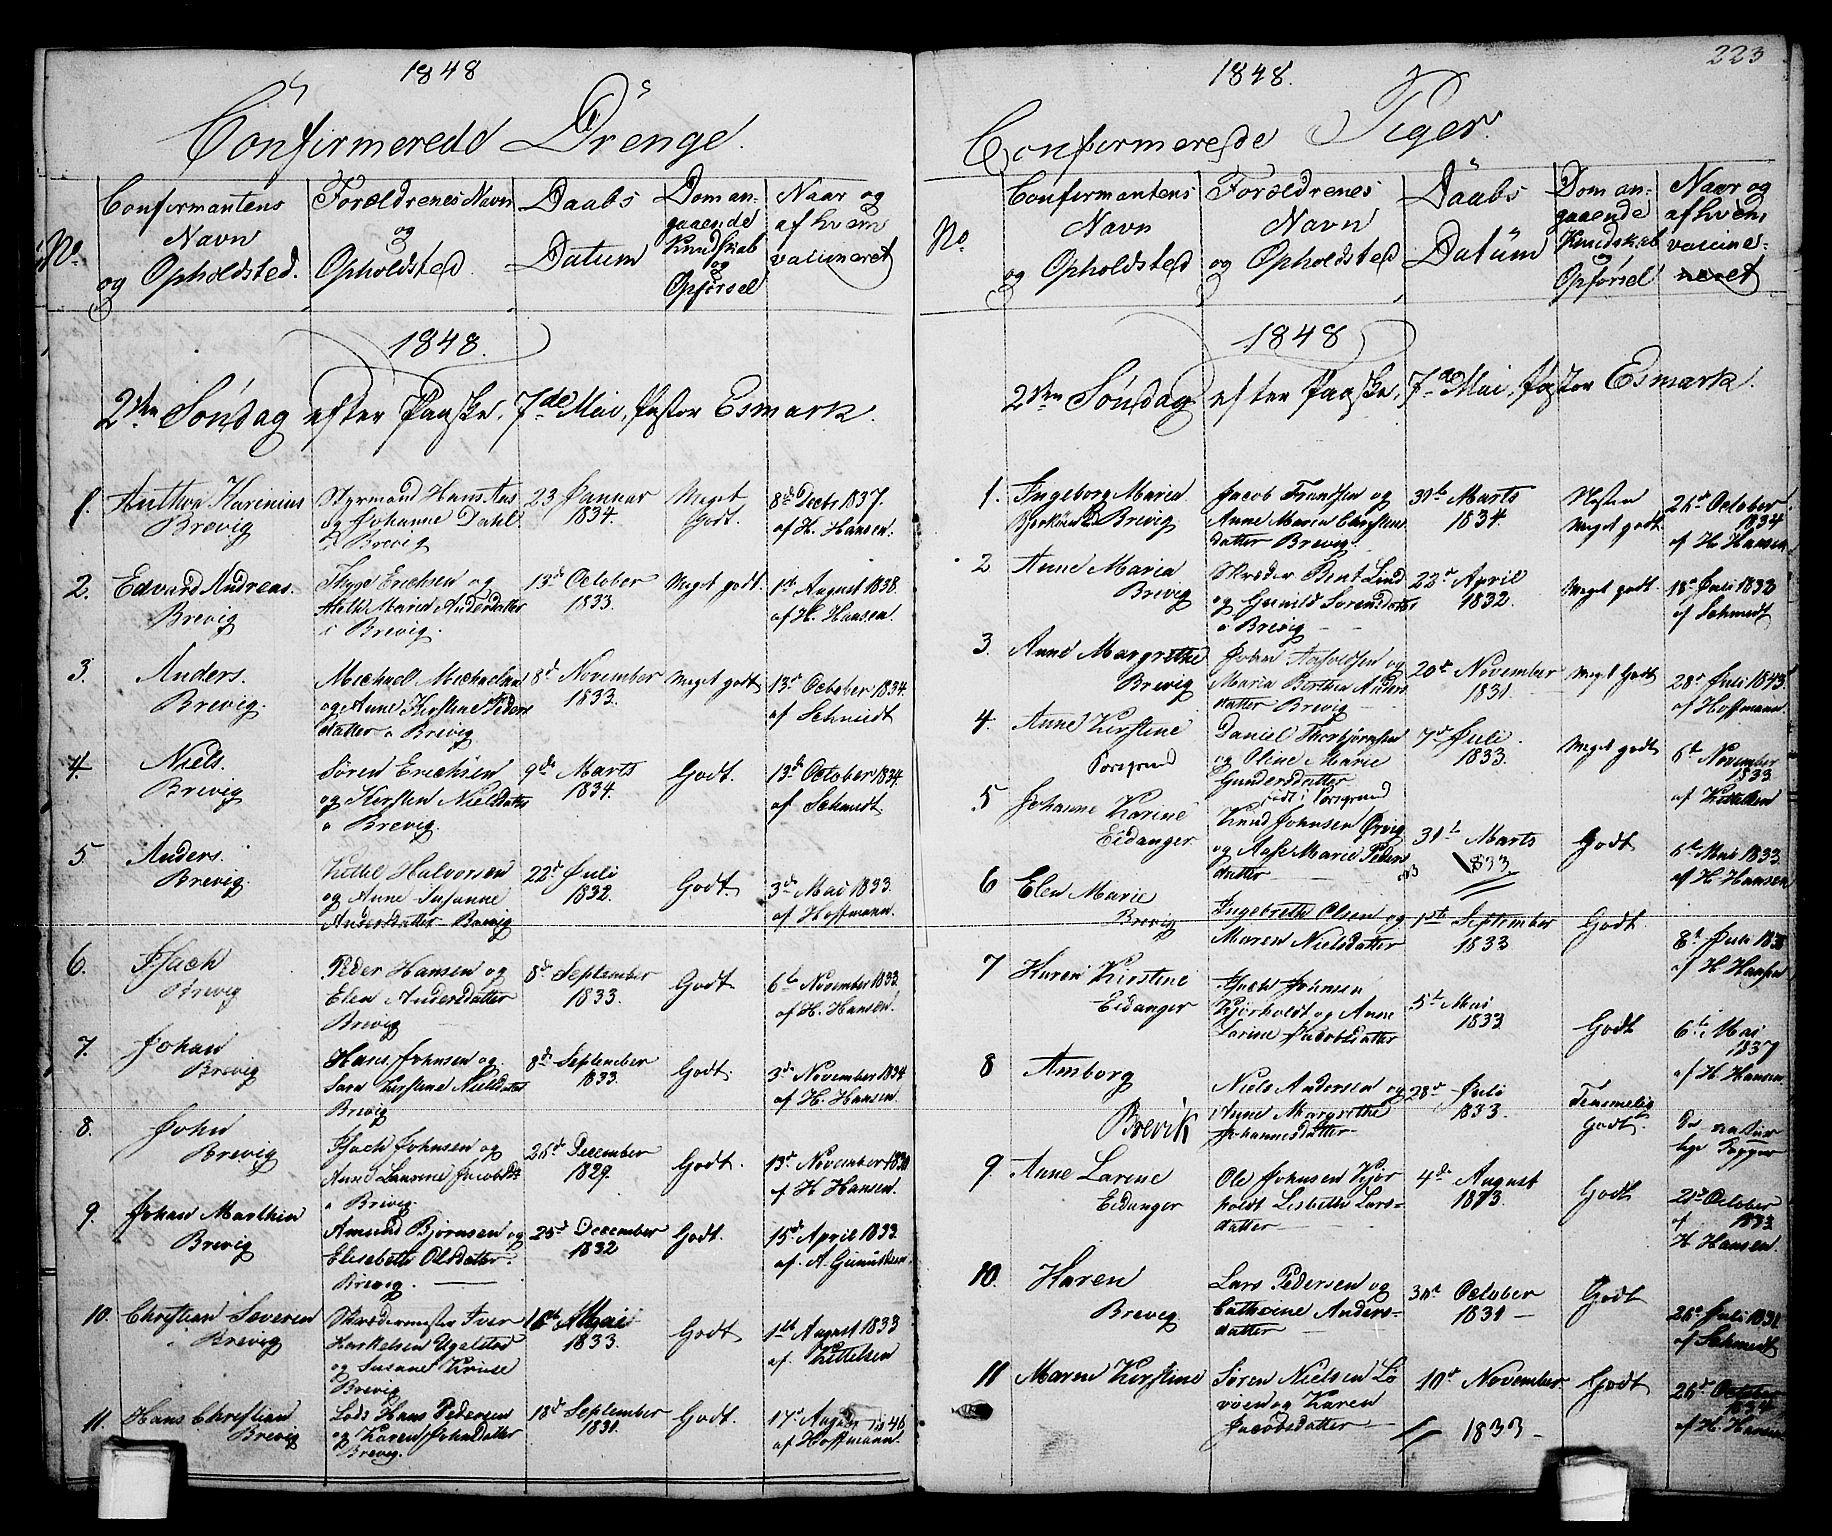 SAKO, Brevik kirkebøker, G/Ga/L0002: Klokkerbok nr. 2, 1846-1865, s. 223